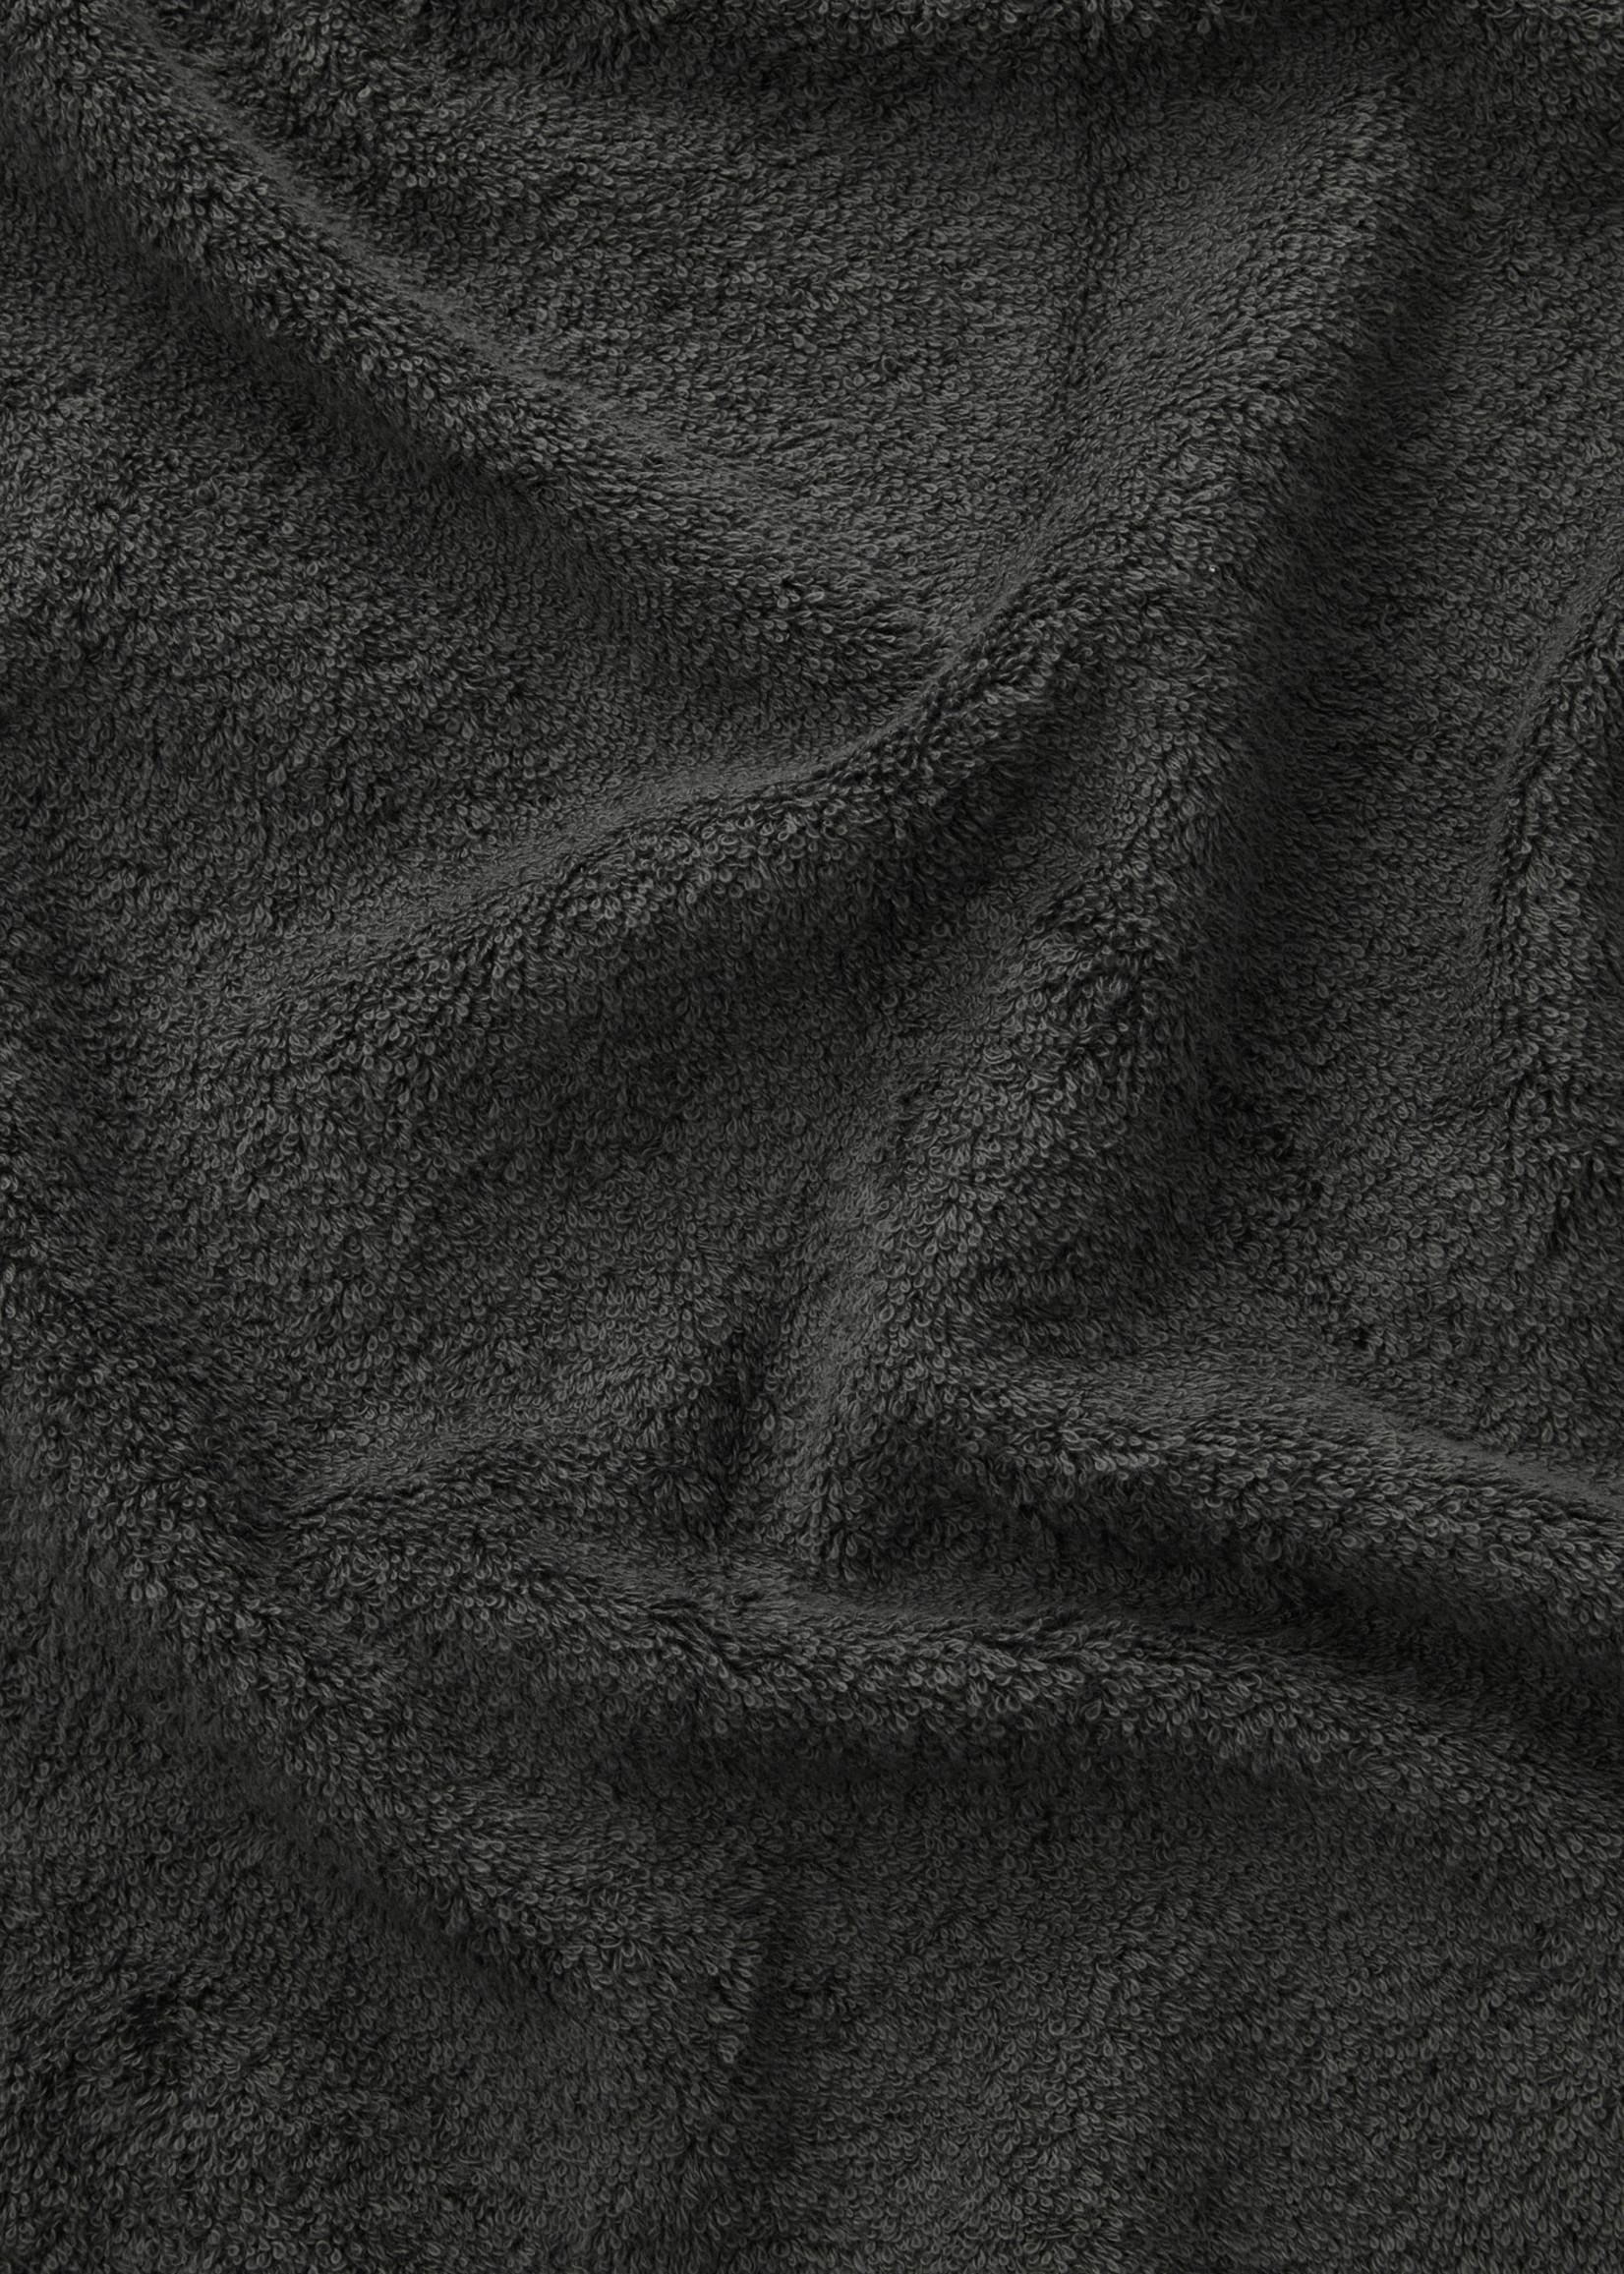 TEKLA Organic Hand Towel in Charcoal